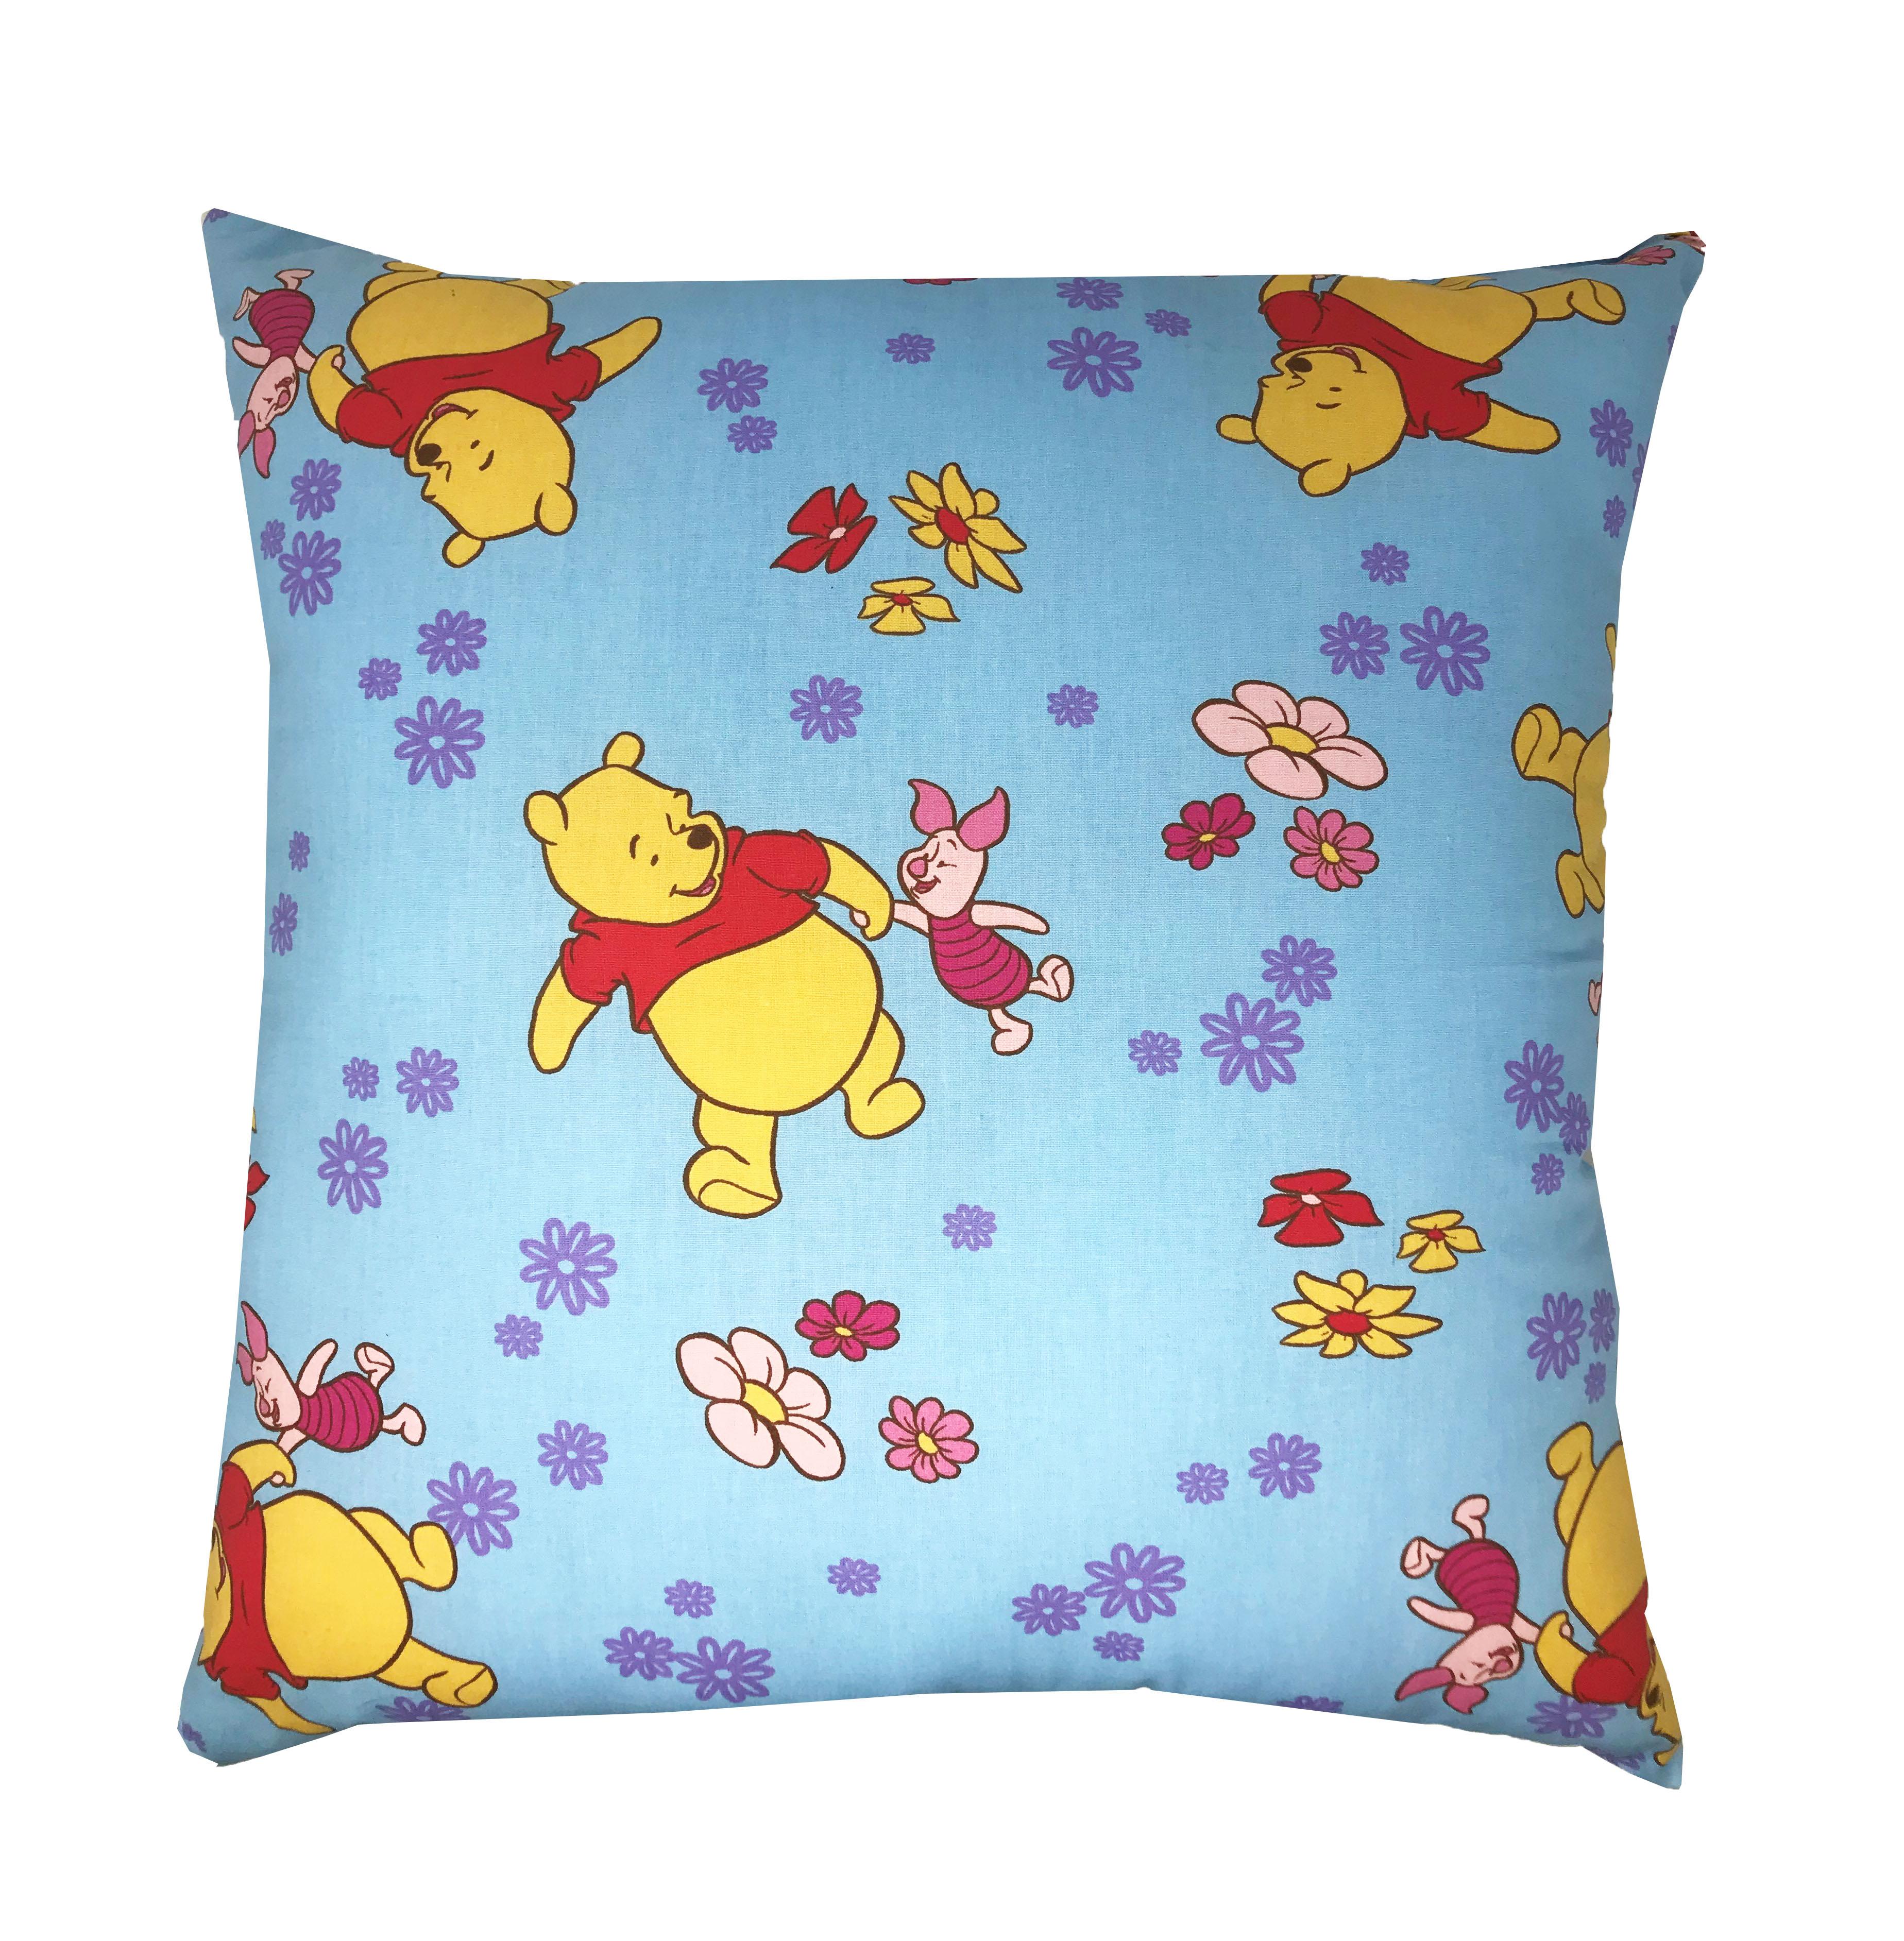 Disney Winnie the Pooh Filled Cushions in Sky Blue